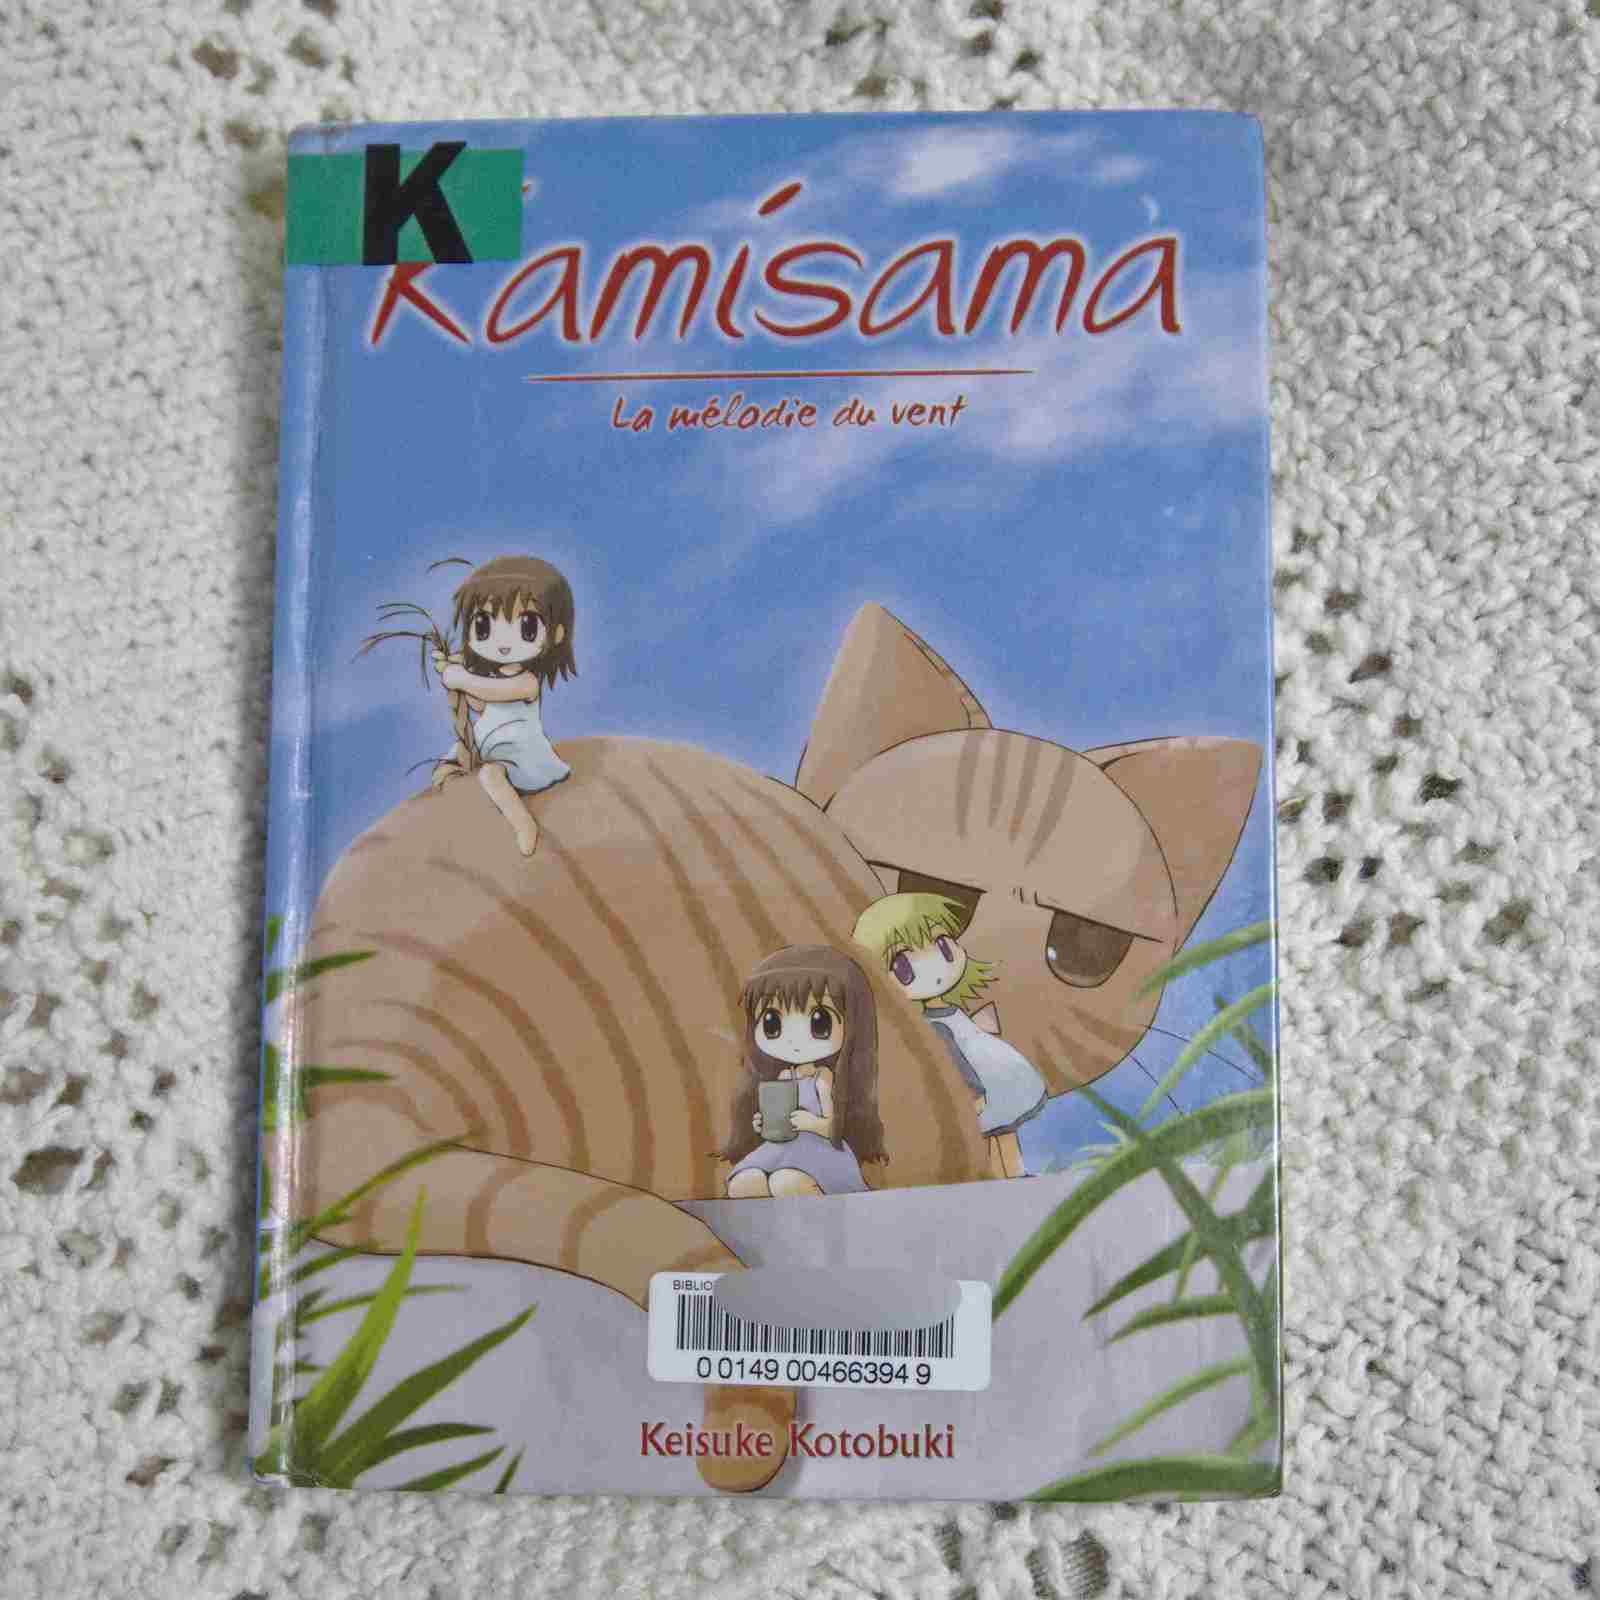 Kamisama, tome 1, la mélodie du vent - Keisuke Kotobuki